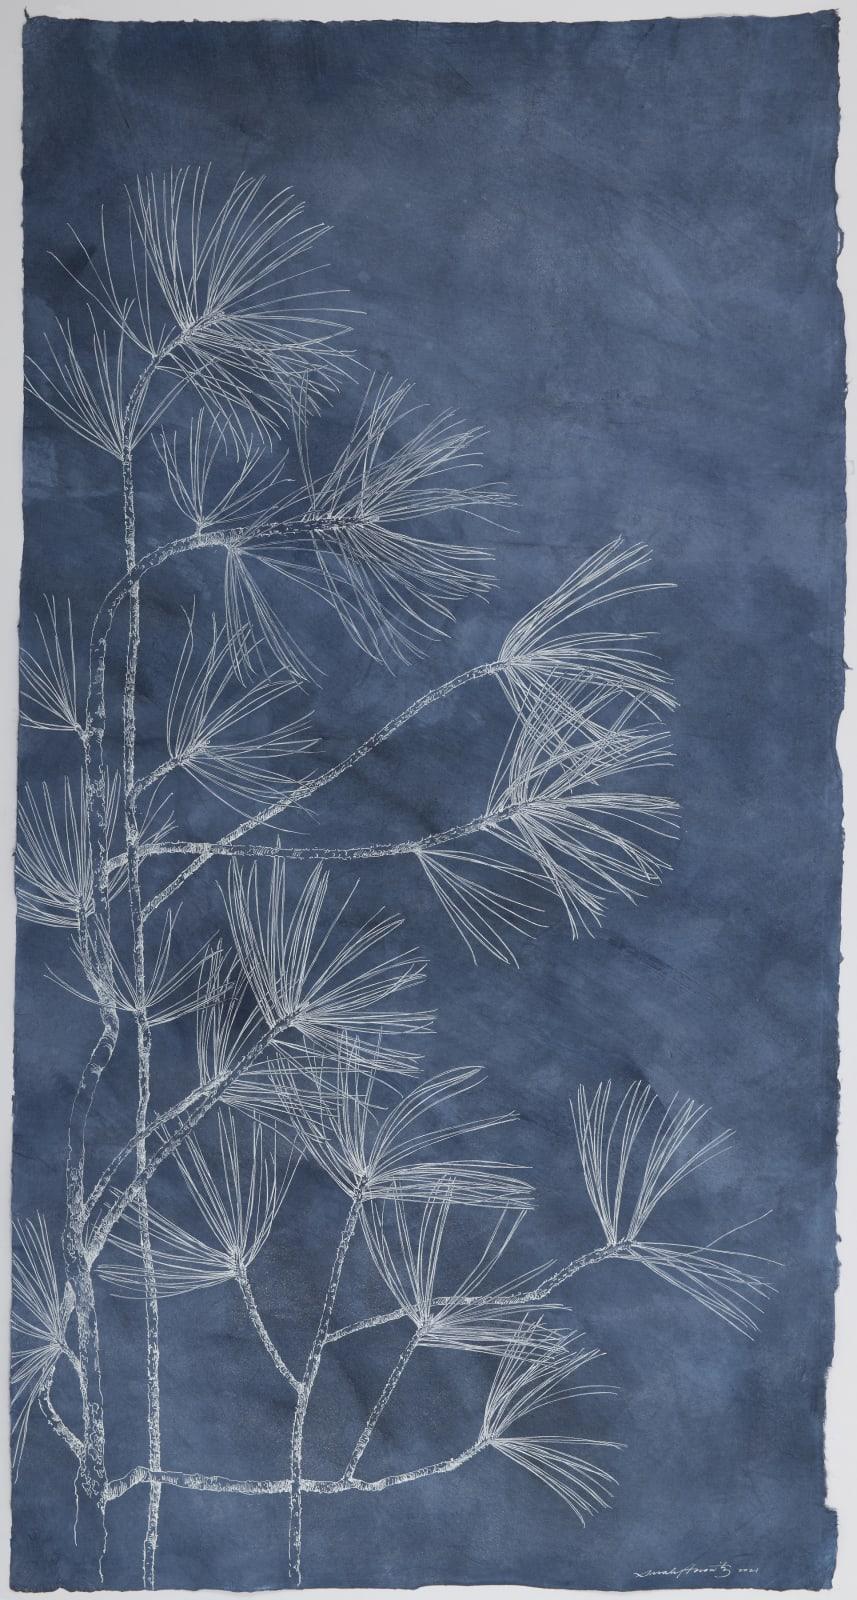 Sarah Horowitz, Dark Blue Pines I, 2021